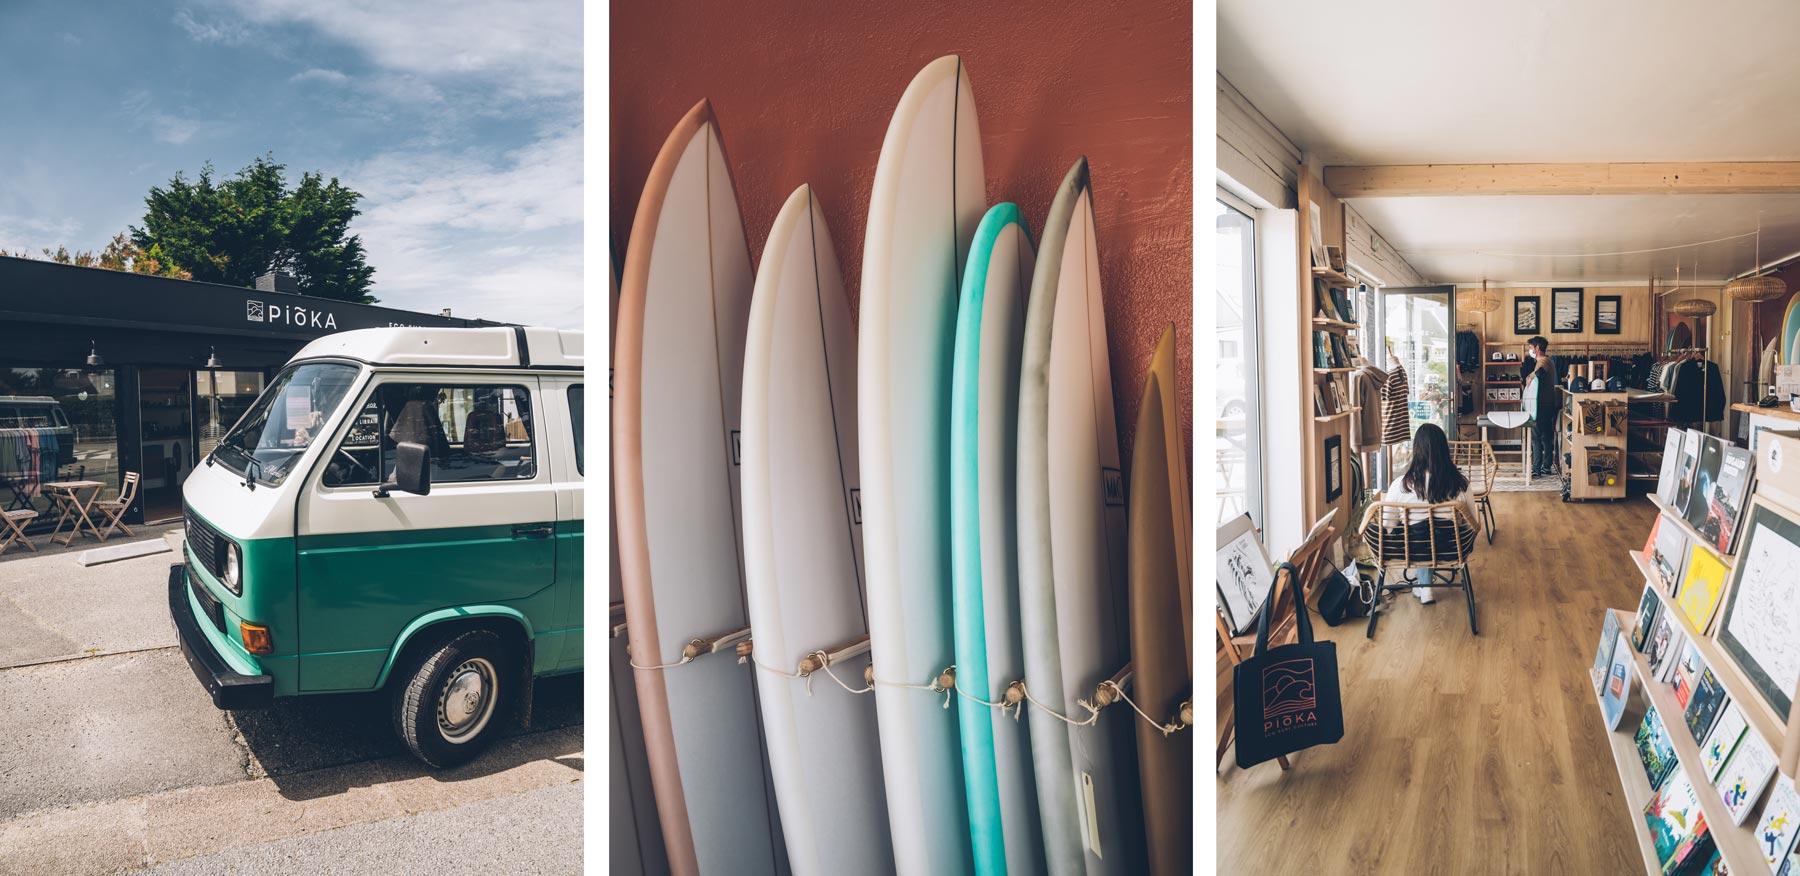 Pioka Surf Shop, Ploemeur, Fort Bloqué